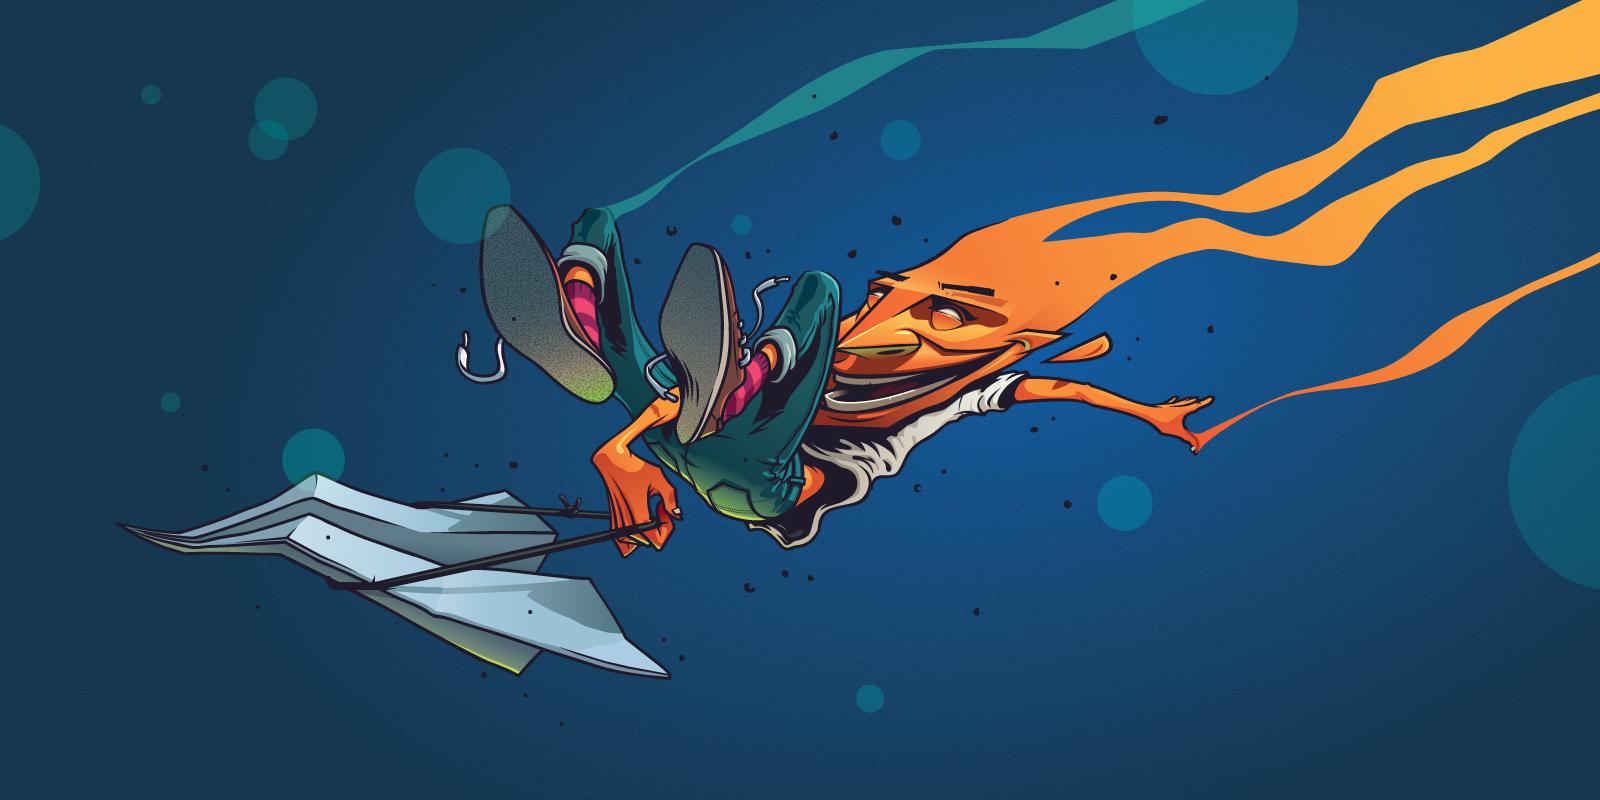 MrPera_illustrations_flying_away